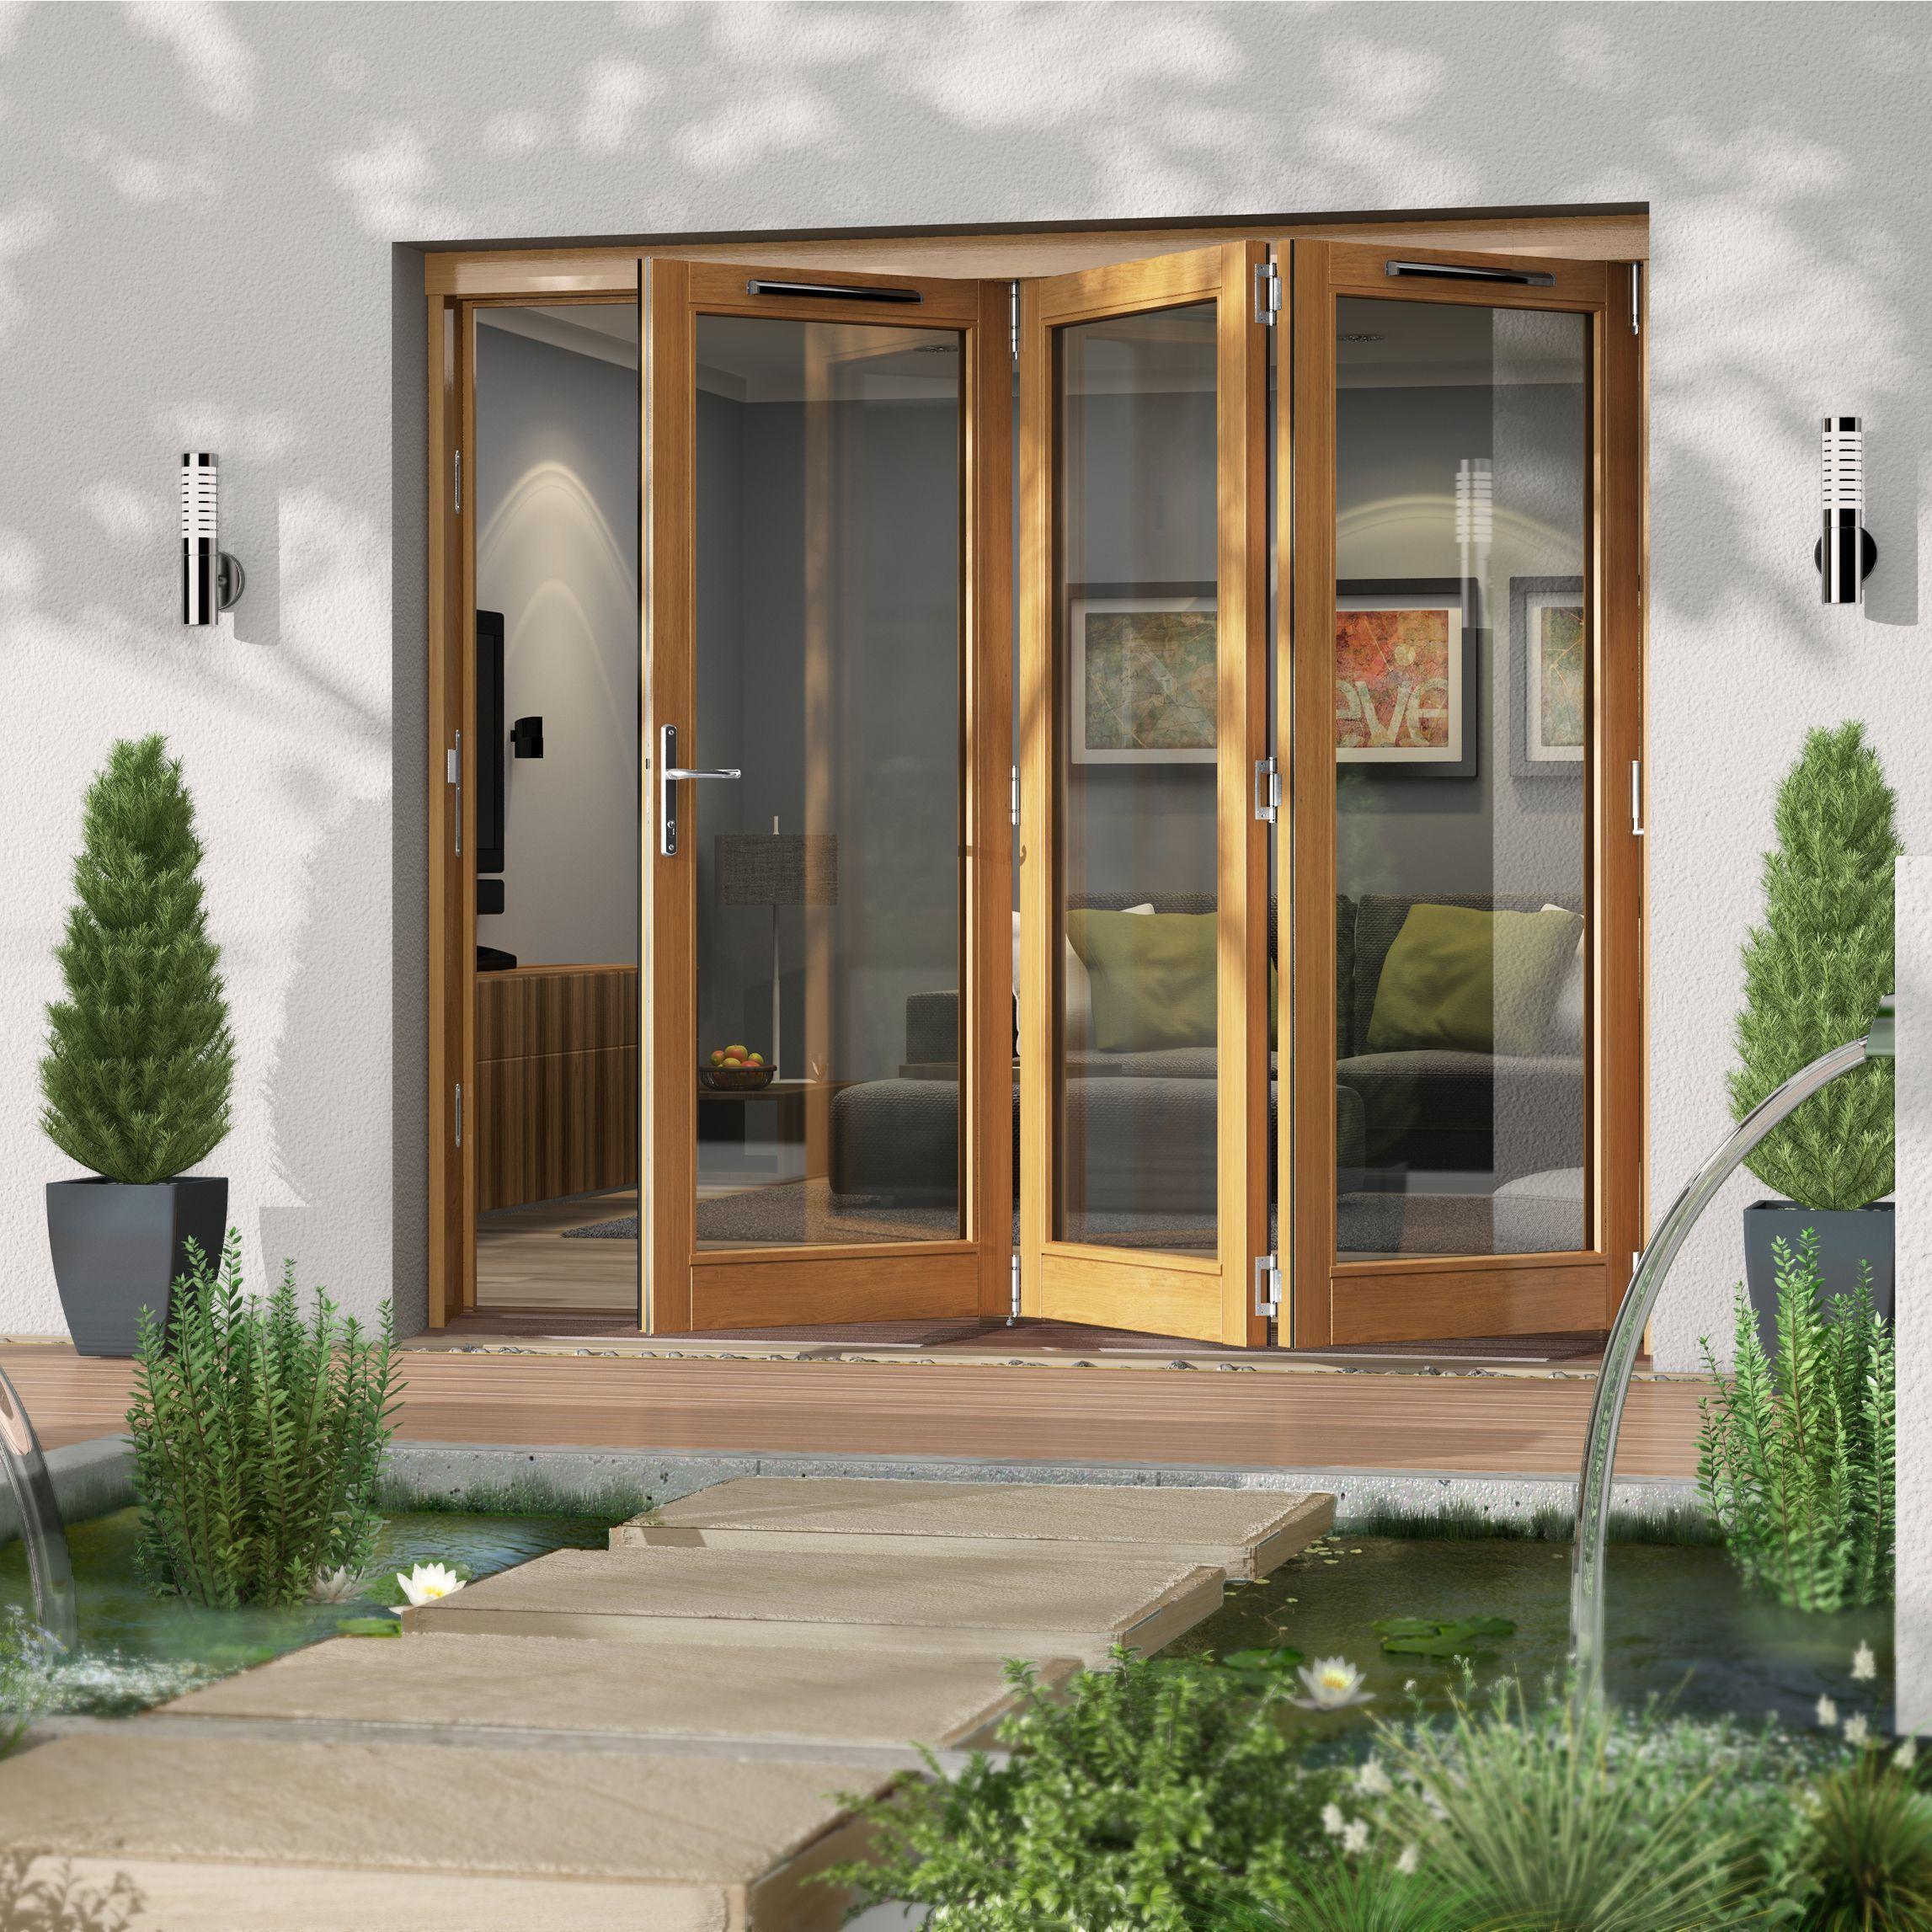 Golden Oak Timber Glazed Folding Patio Door H 2094mm W 2394mm Departments Diy At B Q